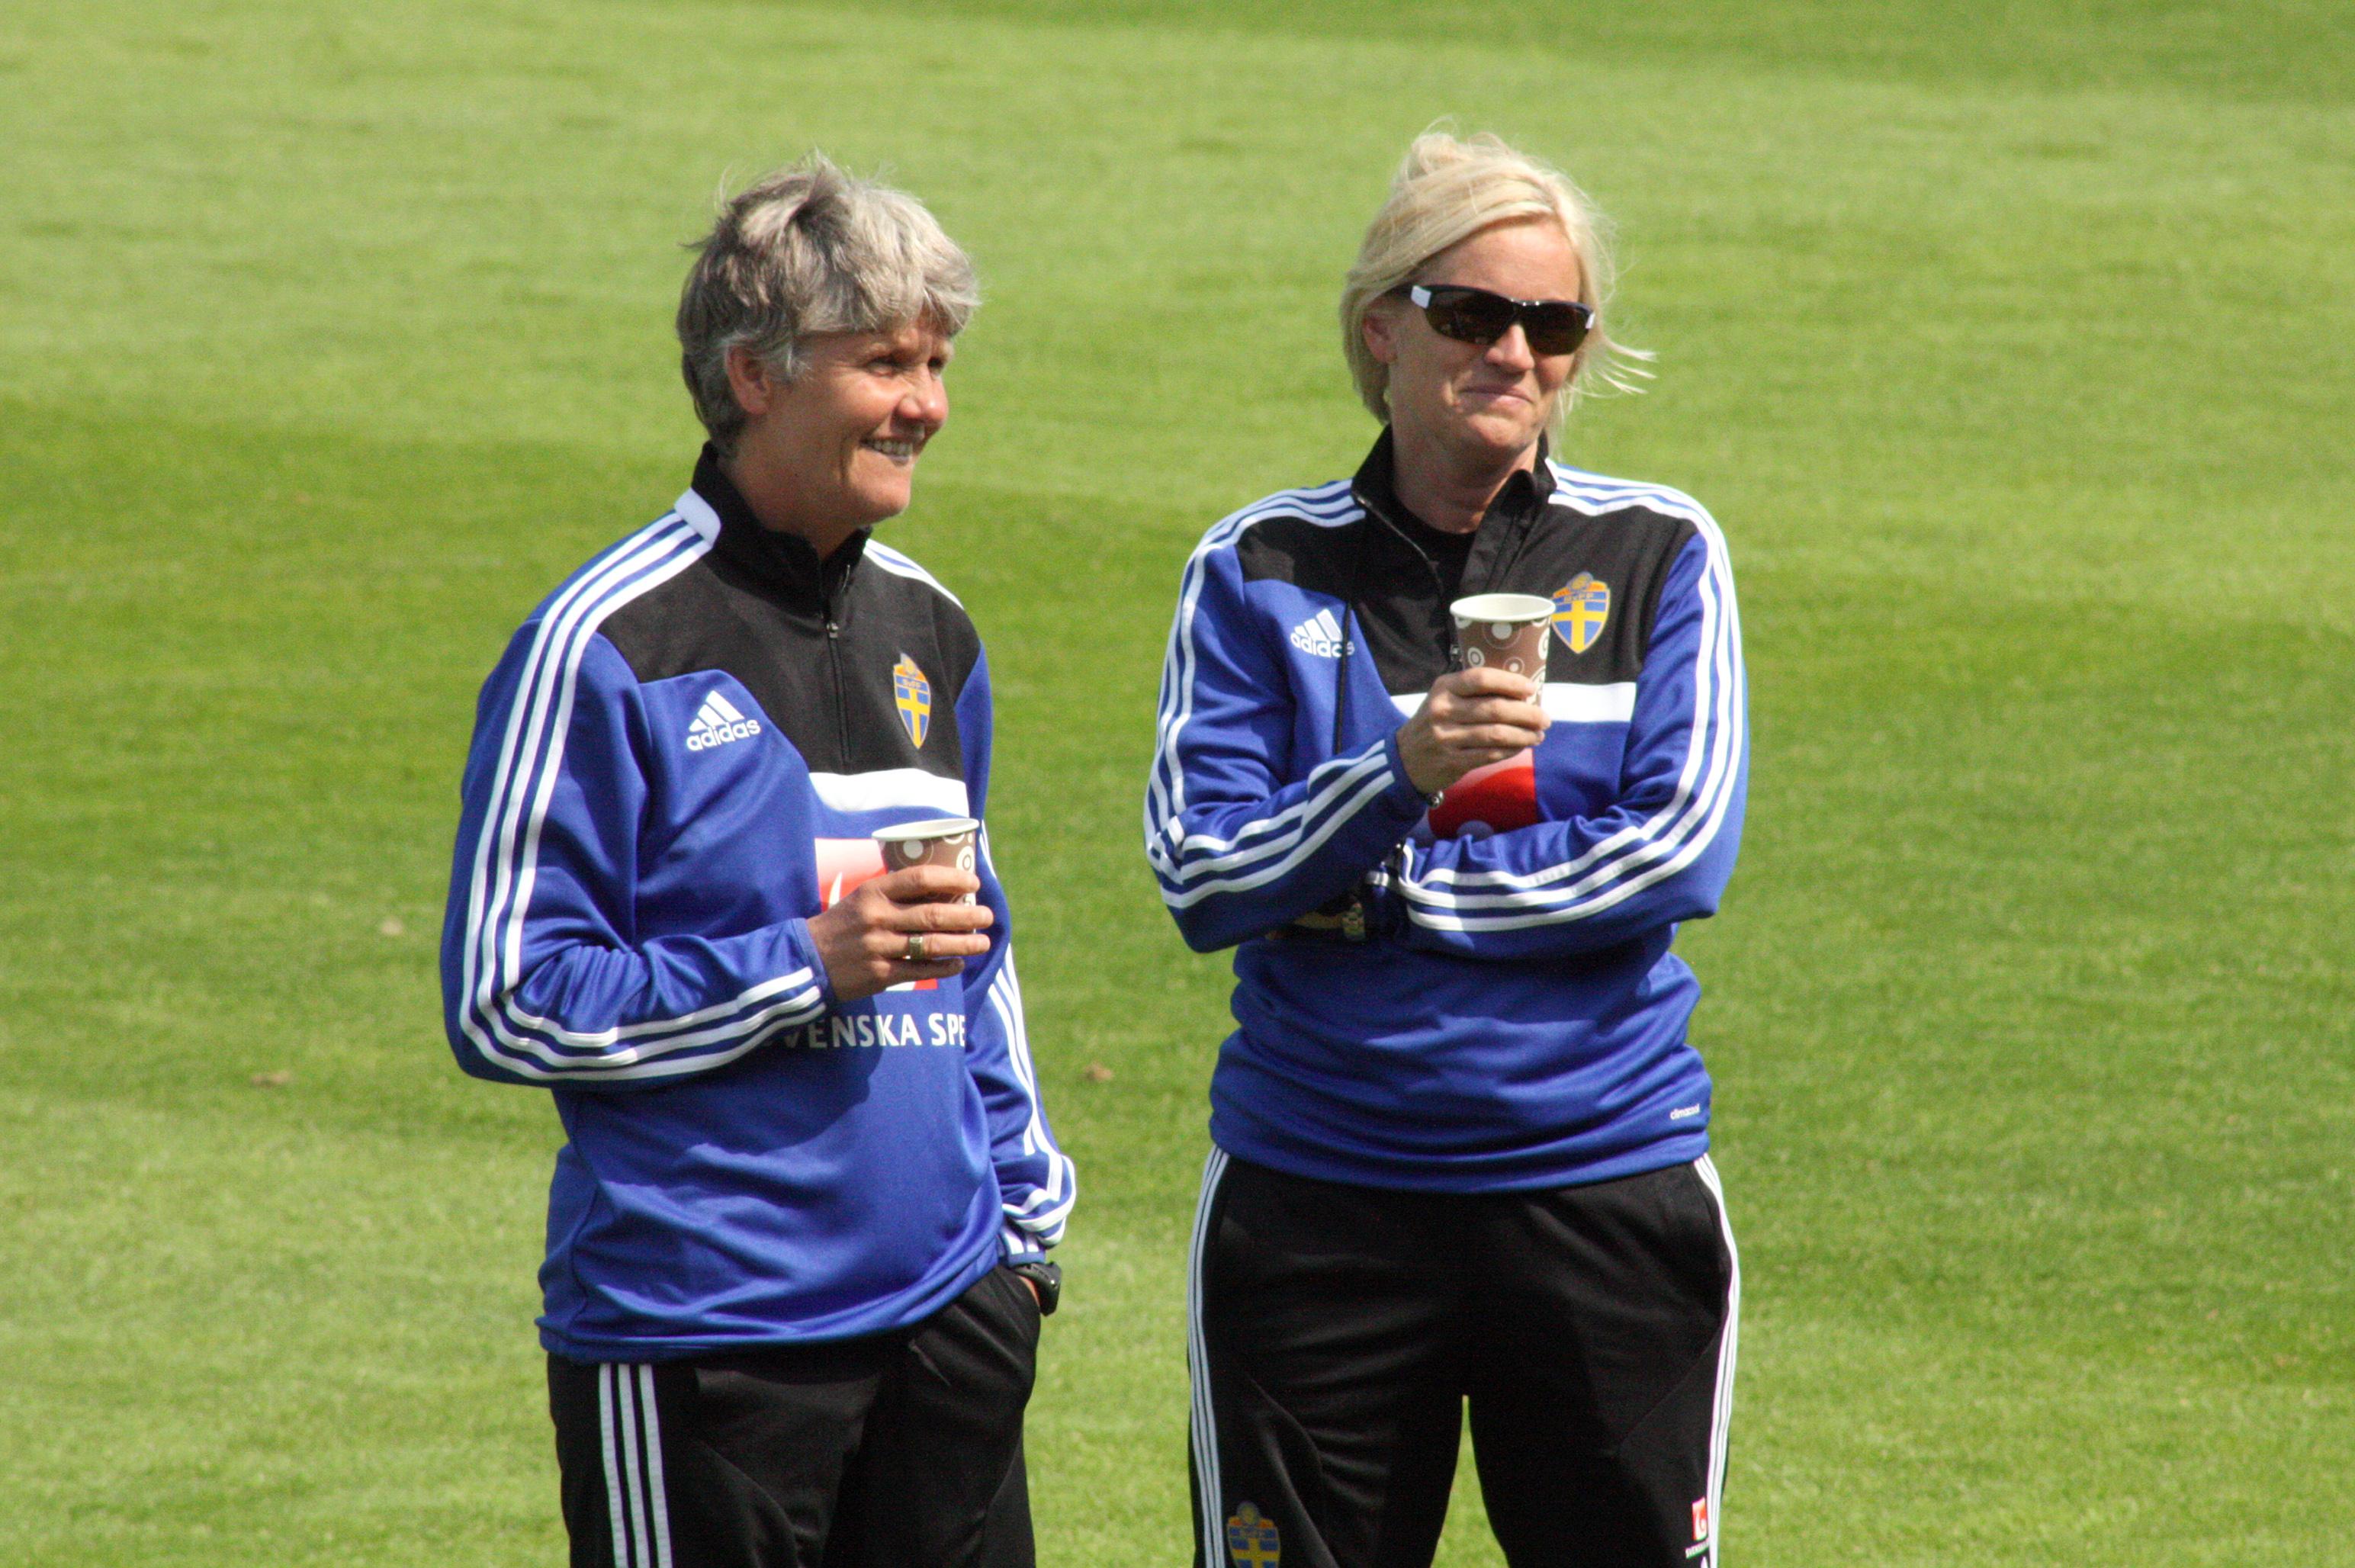 Pia Sundhage och Lilie Persson 3663f8eaf7571